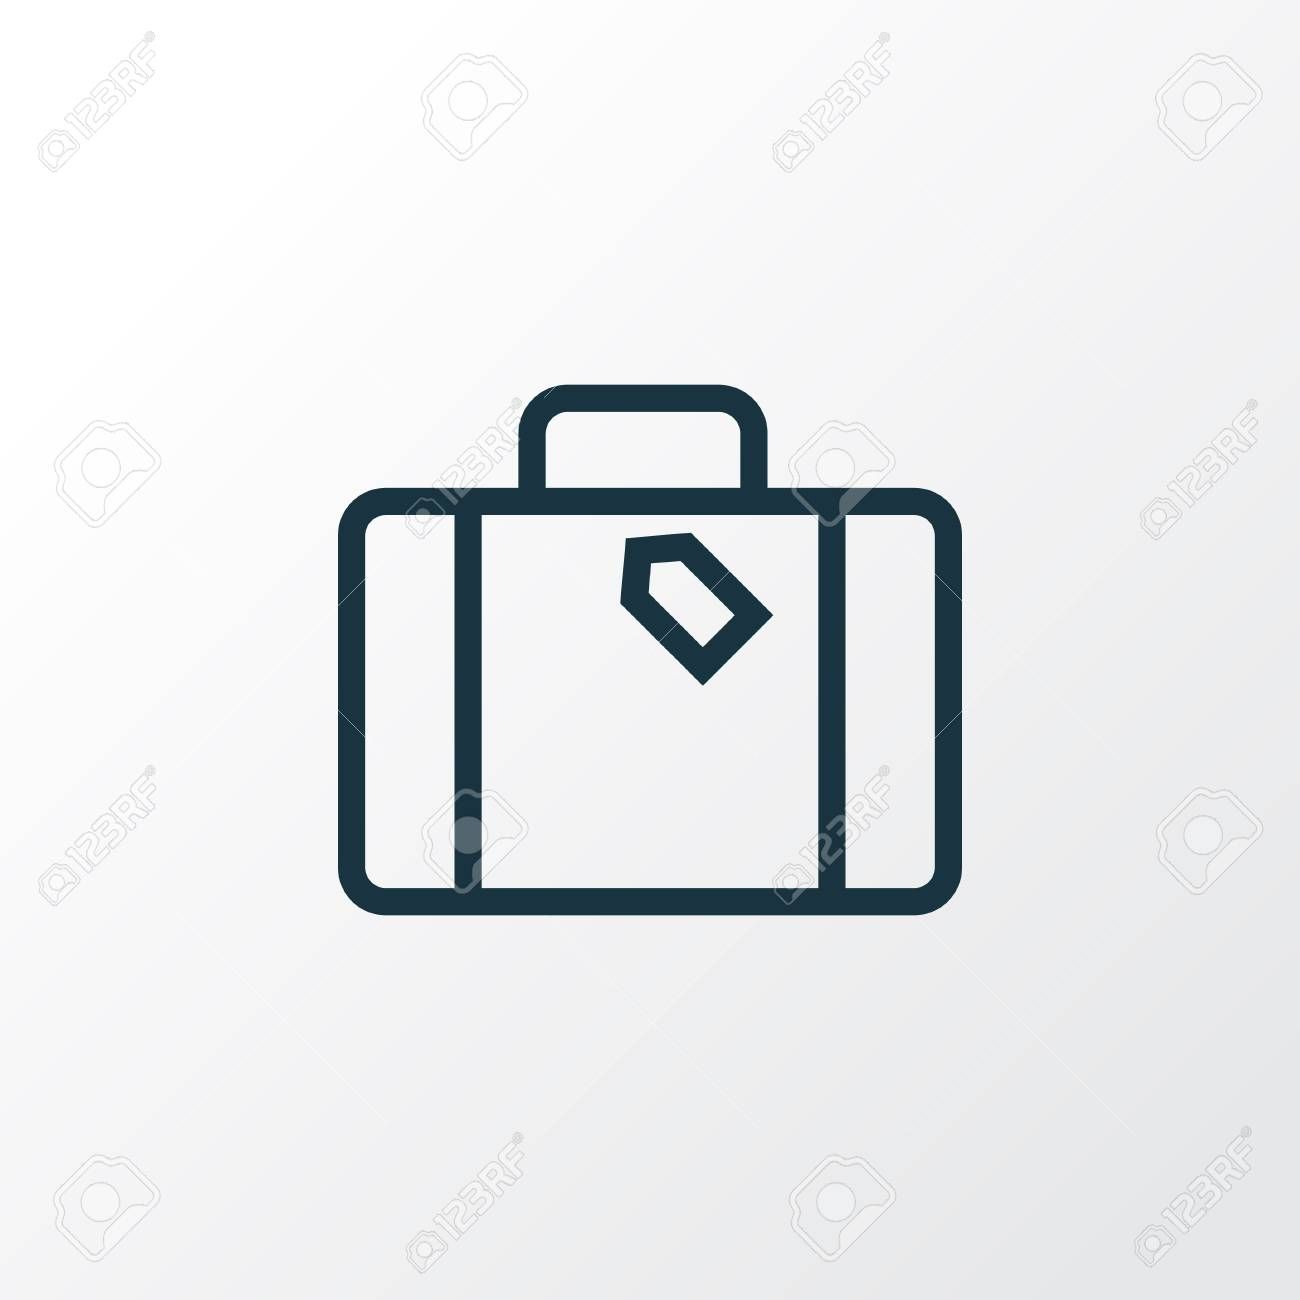 Suitcase Outline Symbol. Premium Quality Isolated Luggage